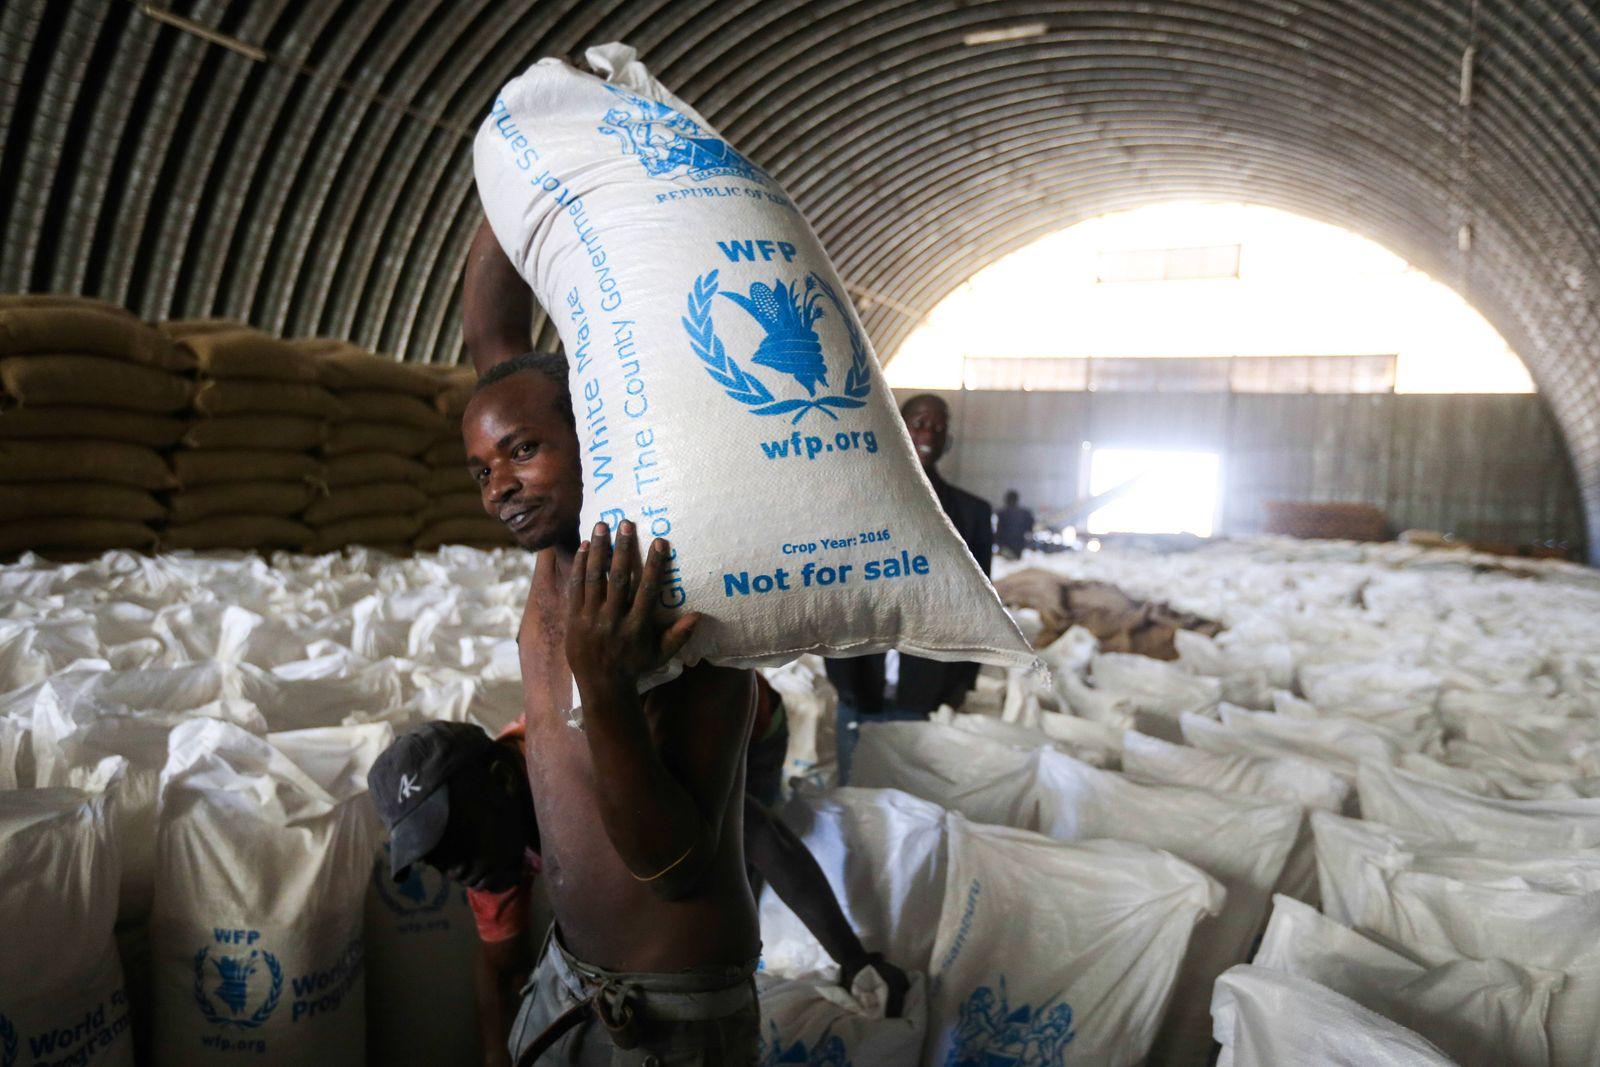 (170303) -- MARALAL, March 3, 2017 -- A worker transfers relief food in Maralal town, Samburu County, Kenya, on March 2